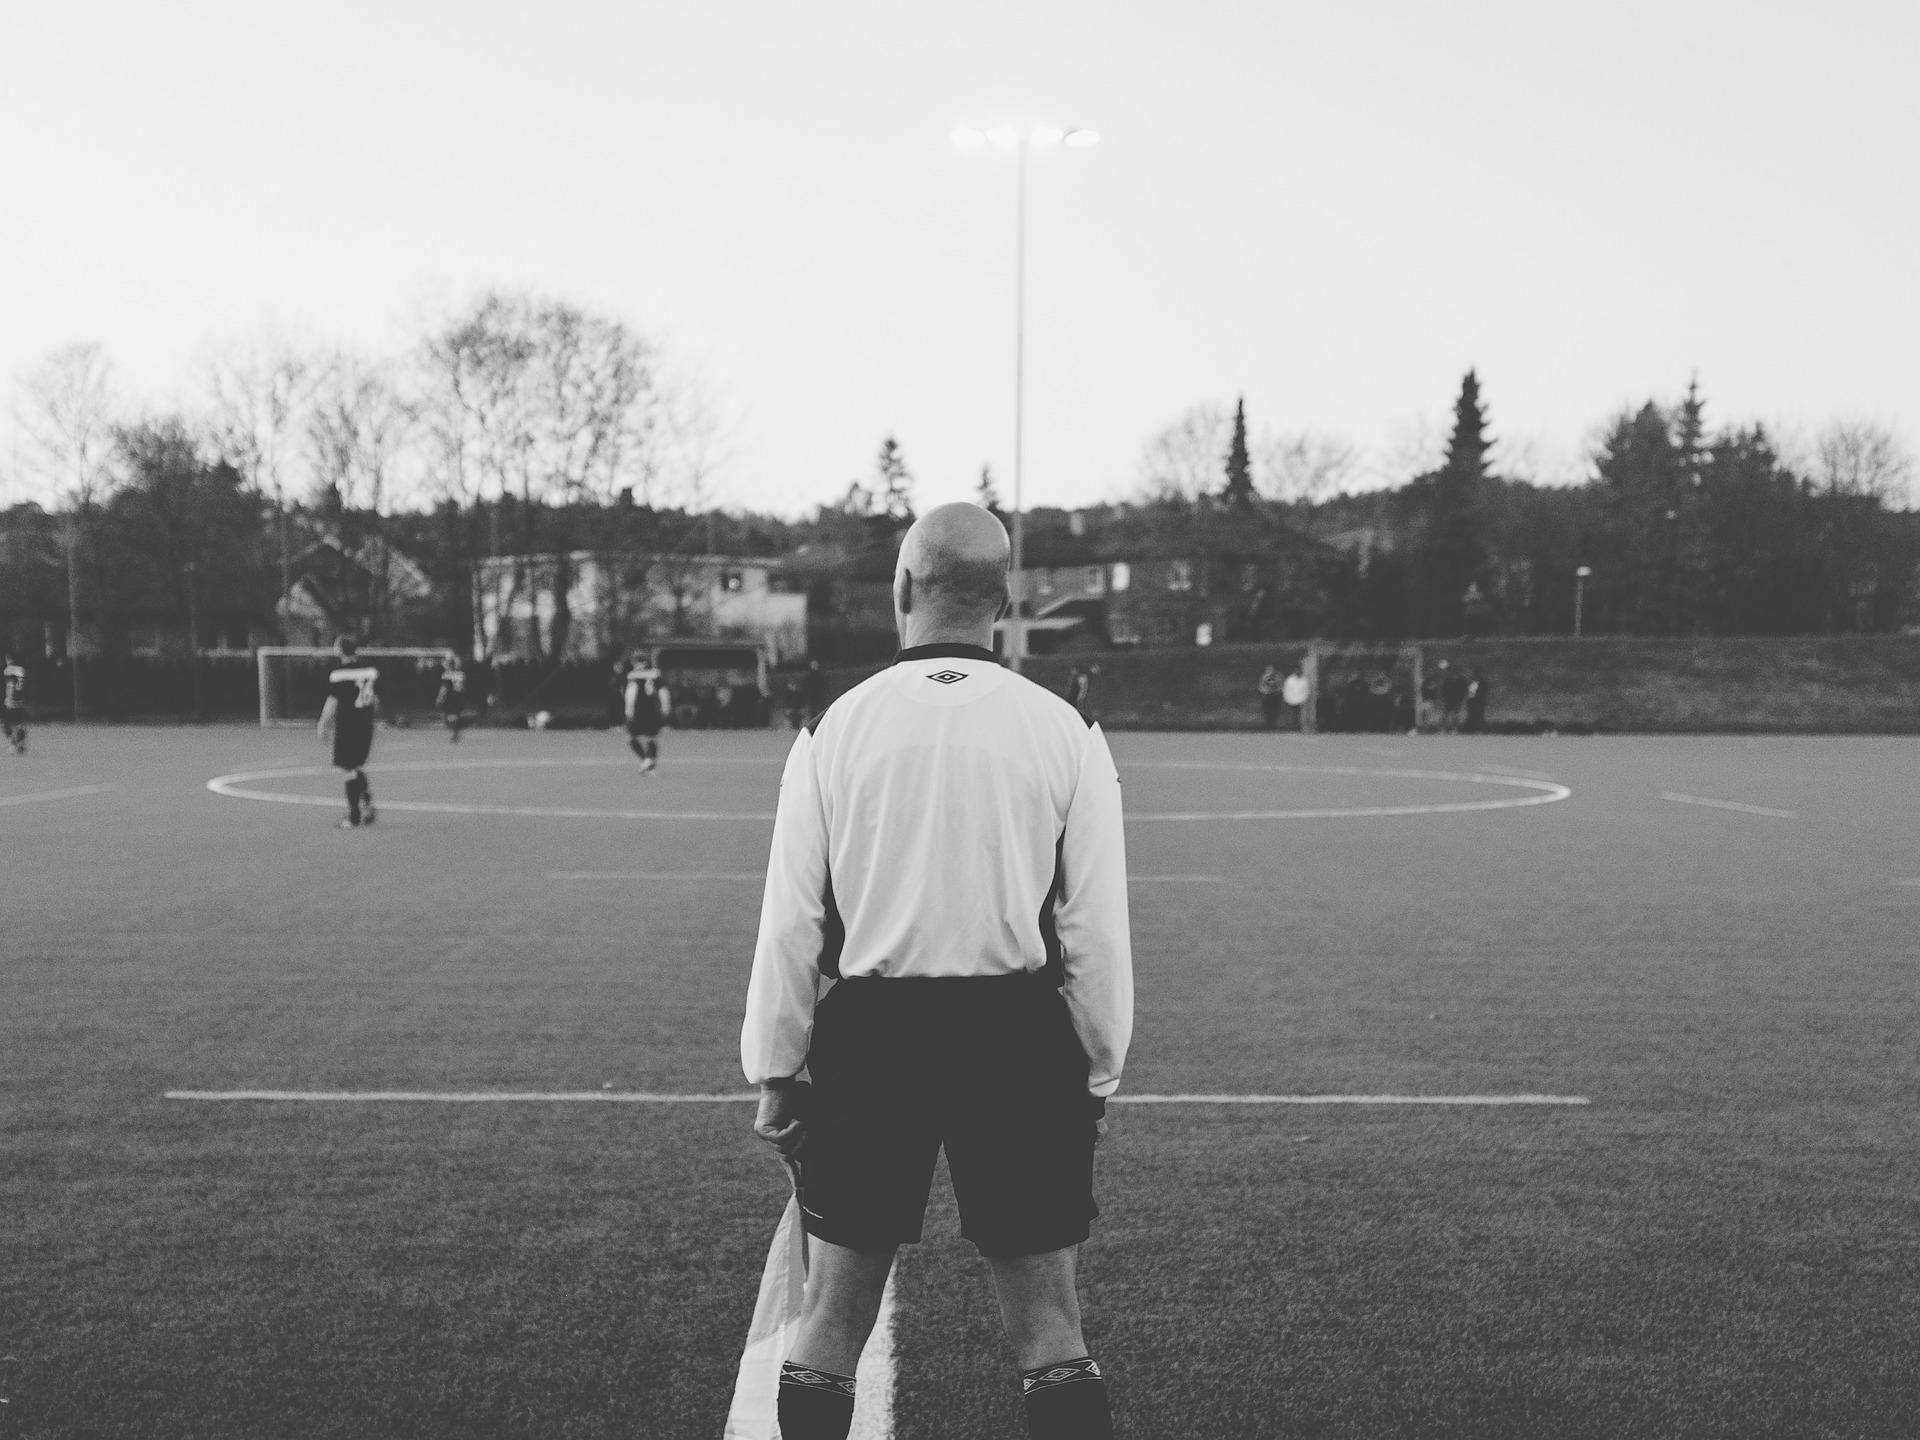 https://pixabay.com/en/football-soccer-field-sports-923172/